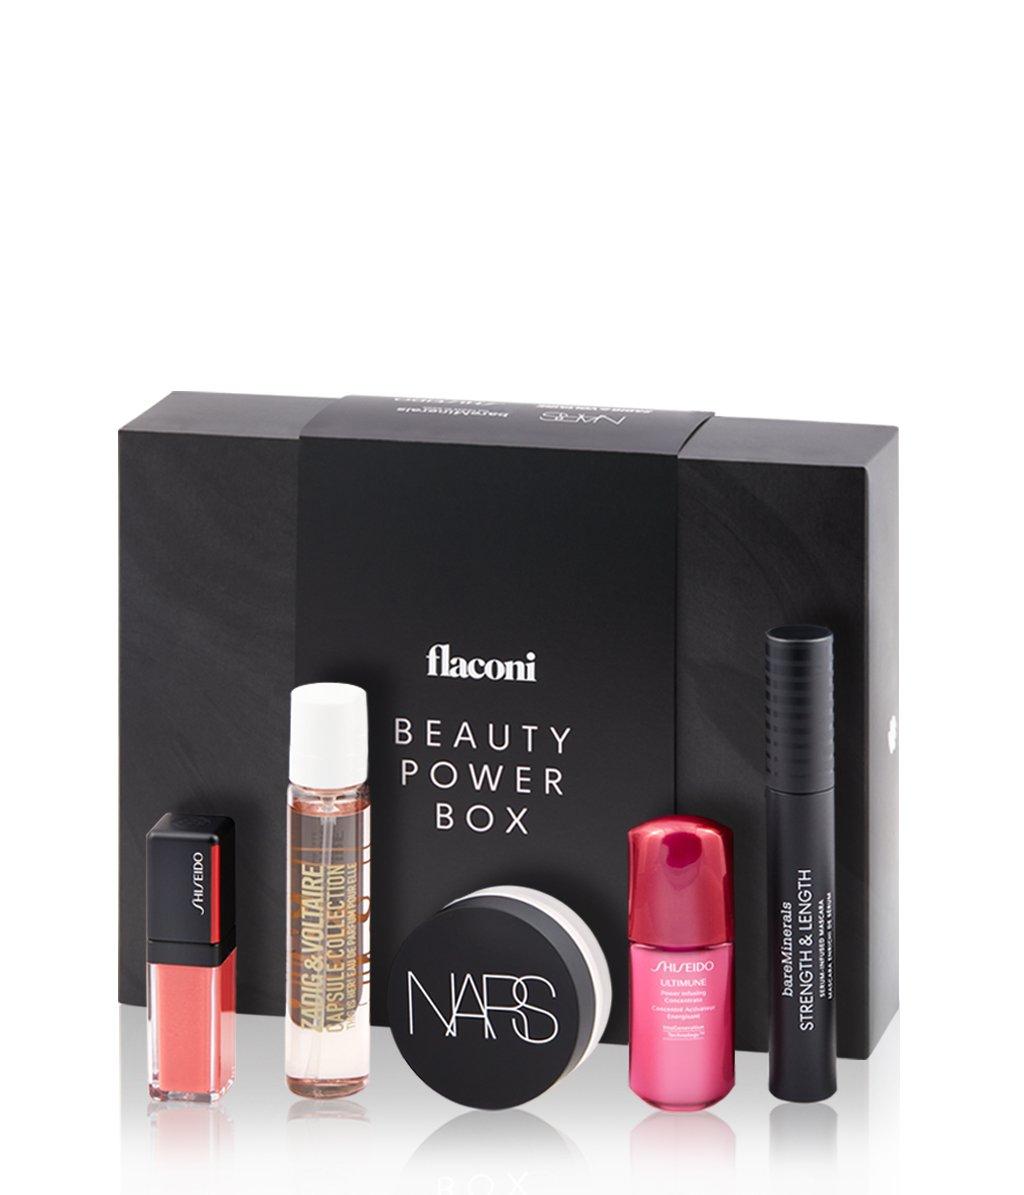 25% Rabatt auf die flaconi Beauty Power Box (1x Parfüm 20 ml + 1x Lipgloss + 1x Gesichtsserum 10 ml + 1x Loser Puder + 1x Mascara)